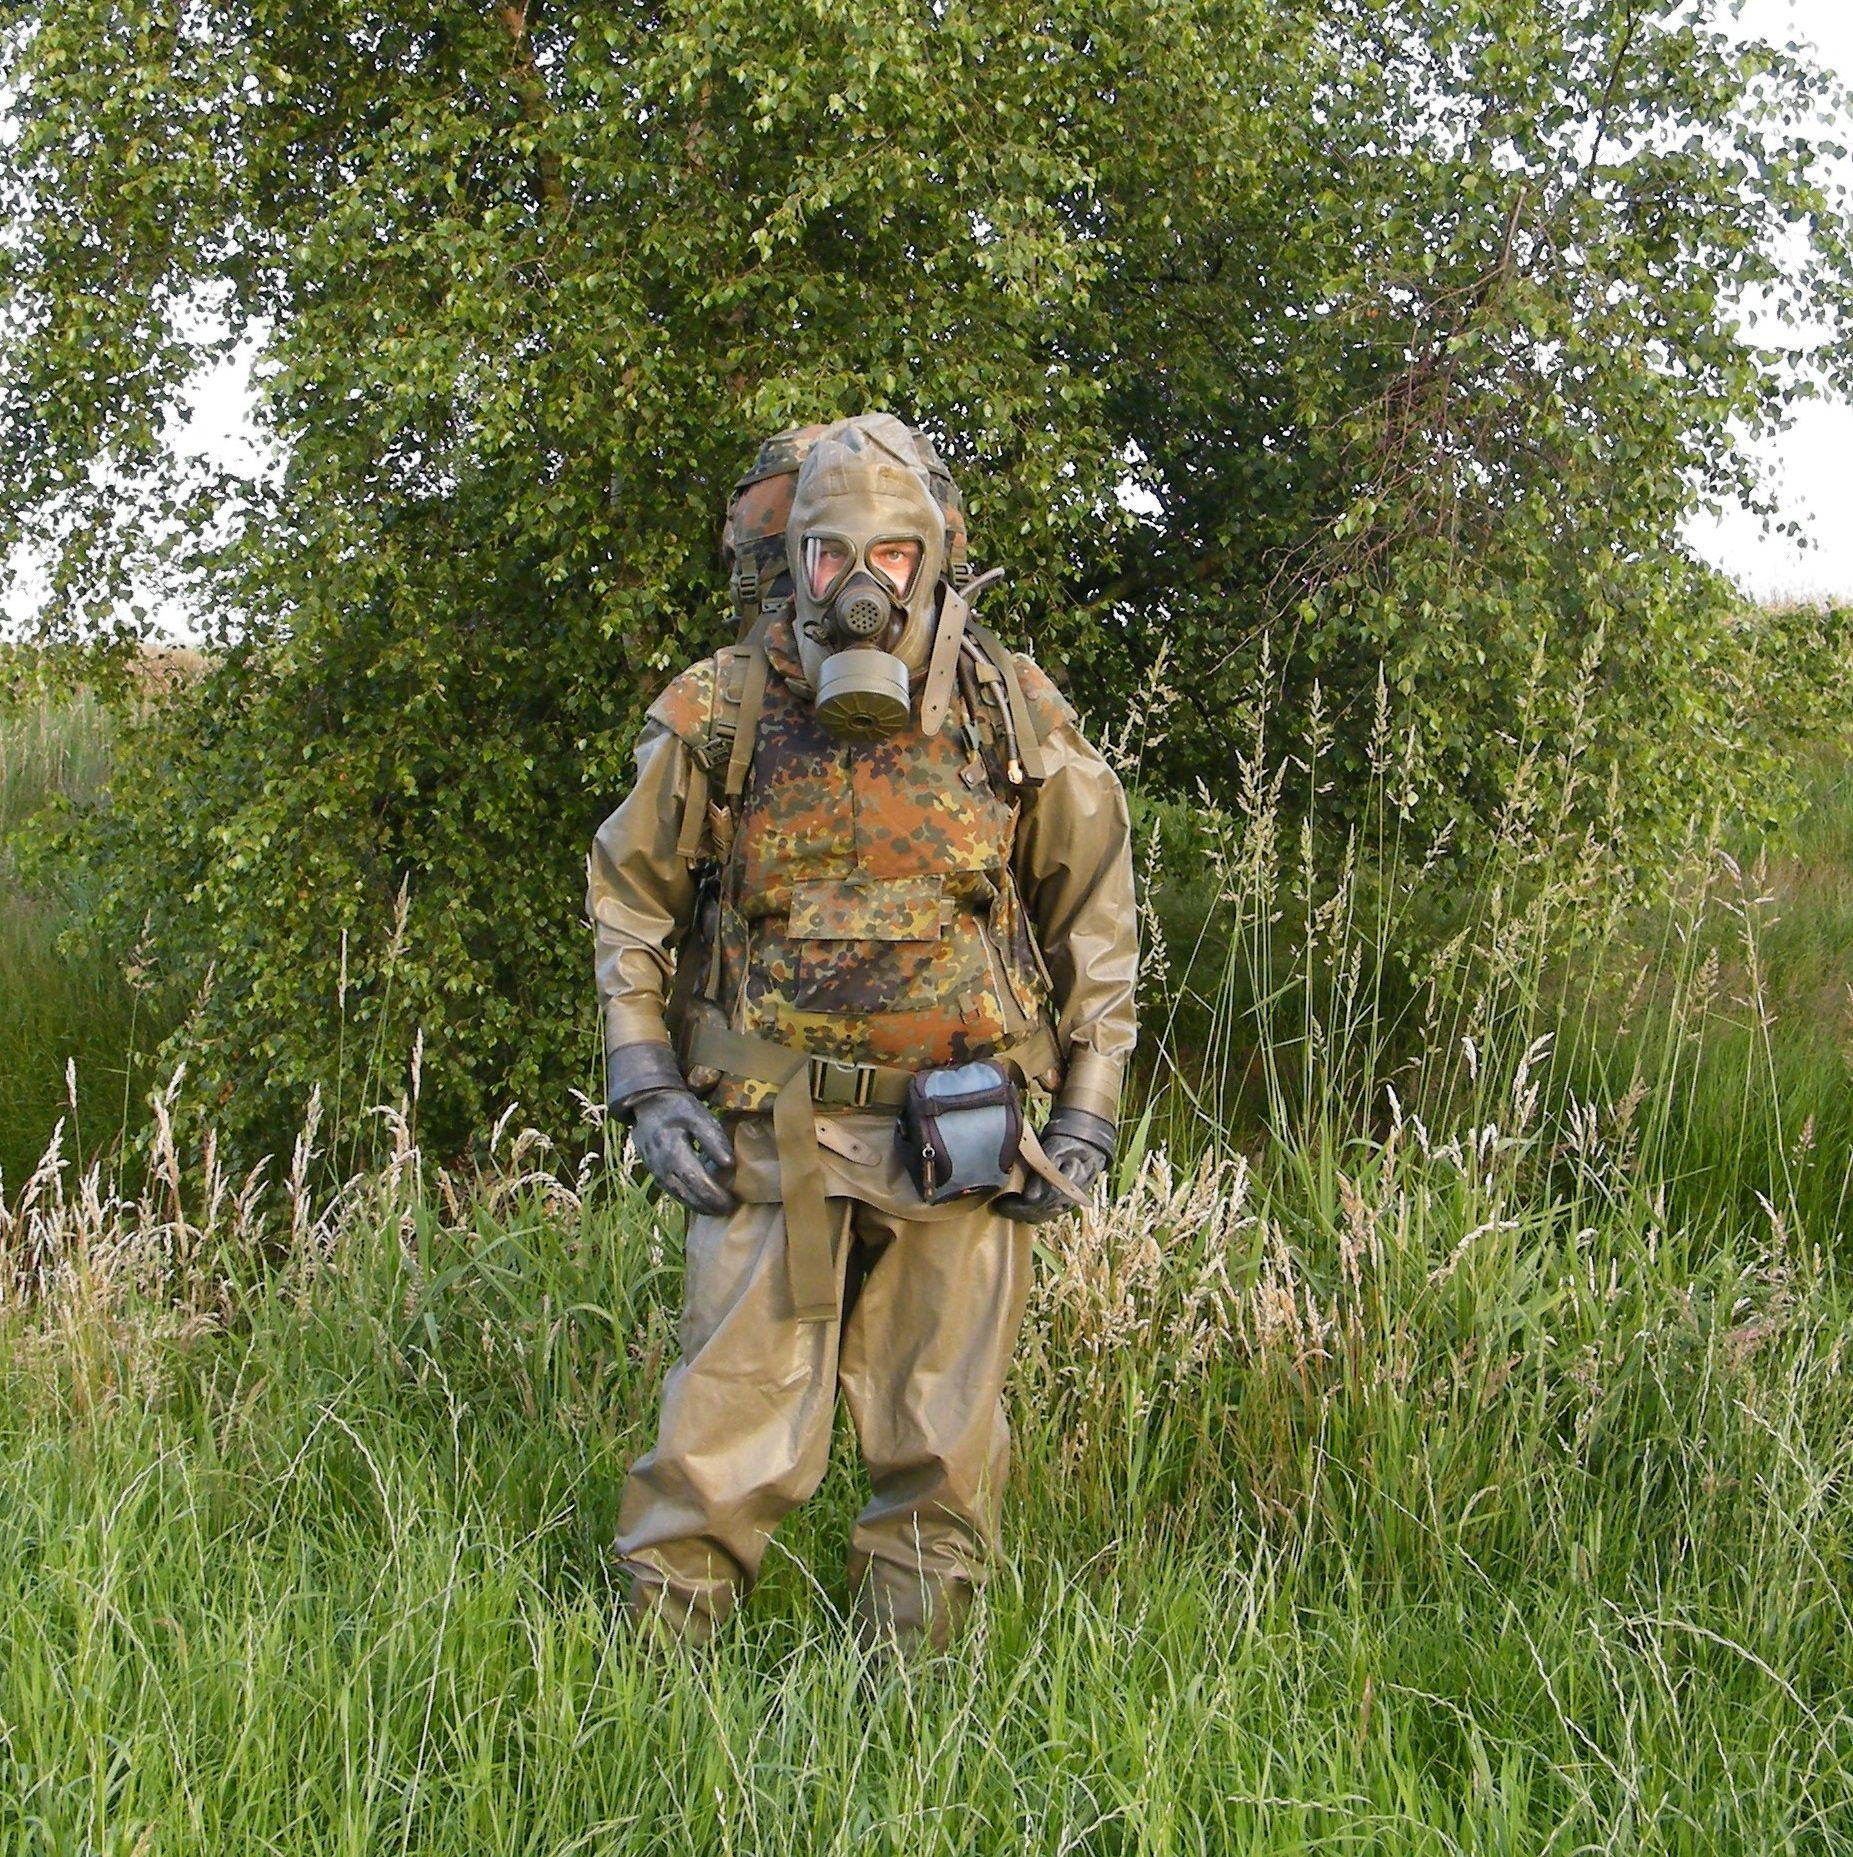 Outdoor wearing the German CBRN suit